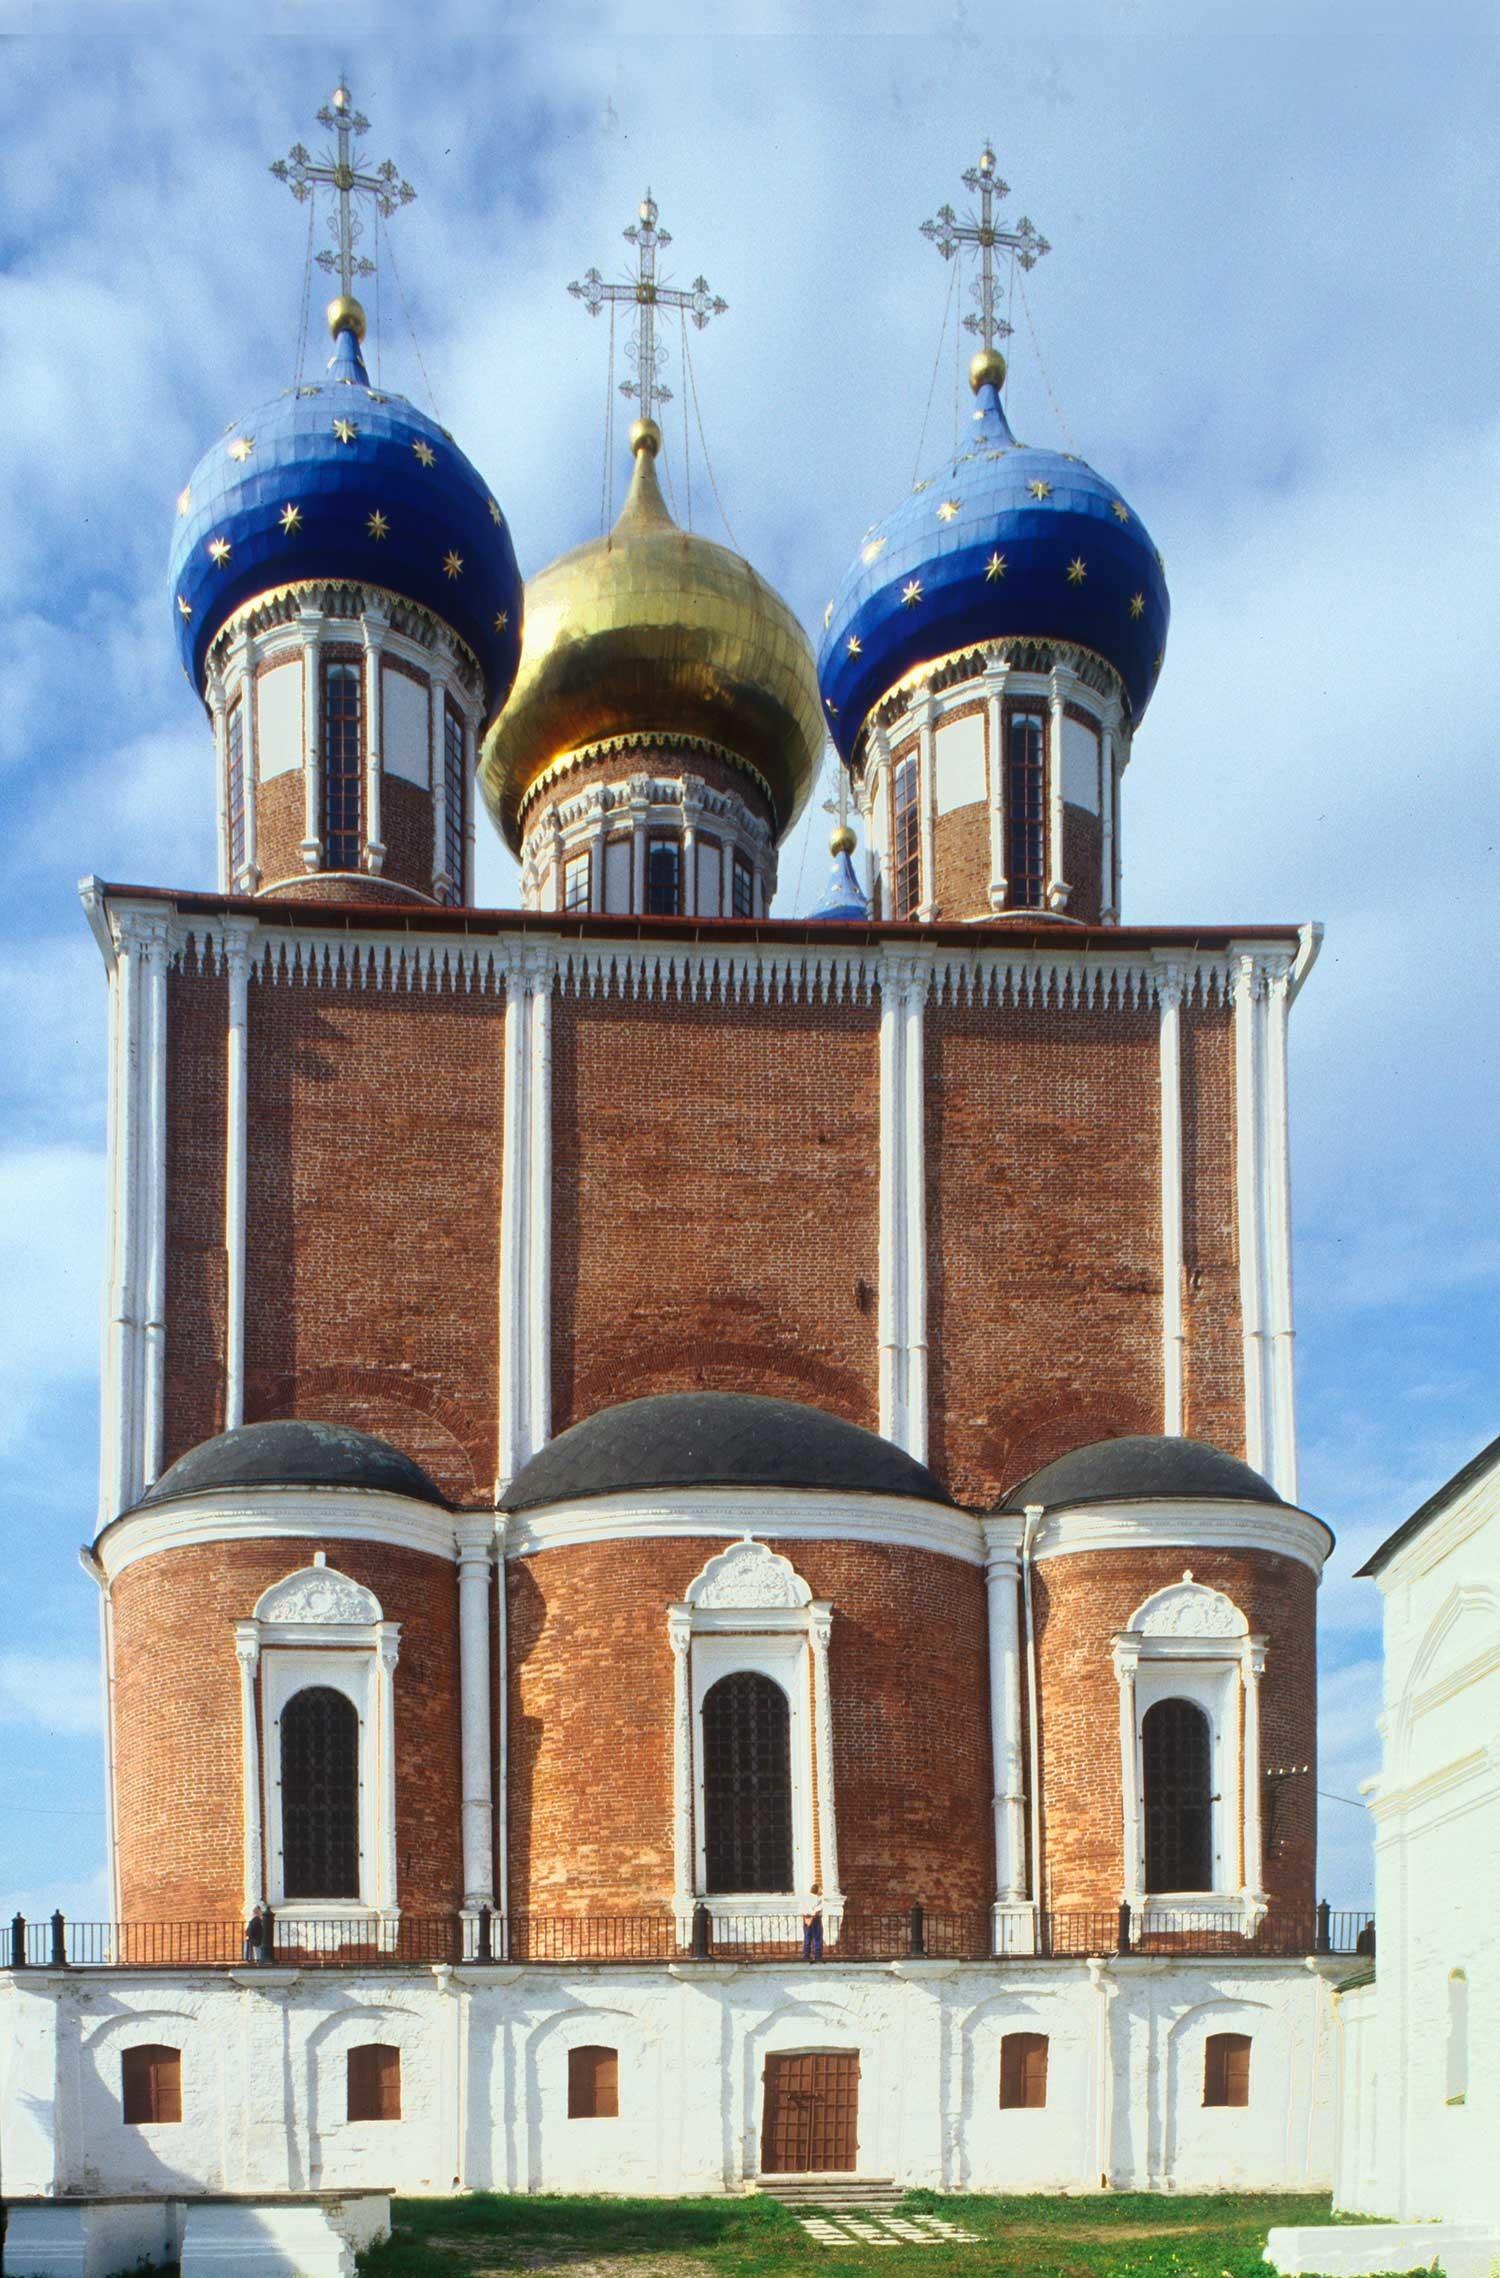 Kremlin de Riazán. Catedral Dormition, vista este. 28 de agosto de 2005.